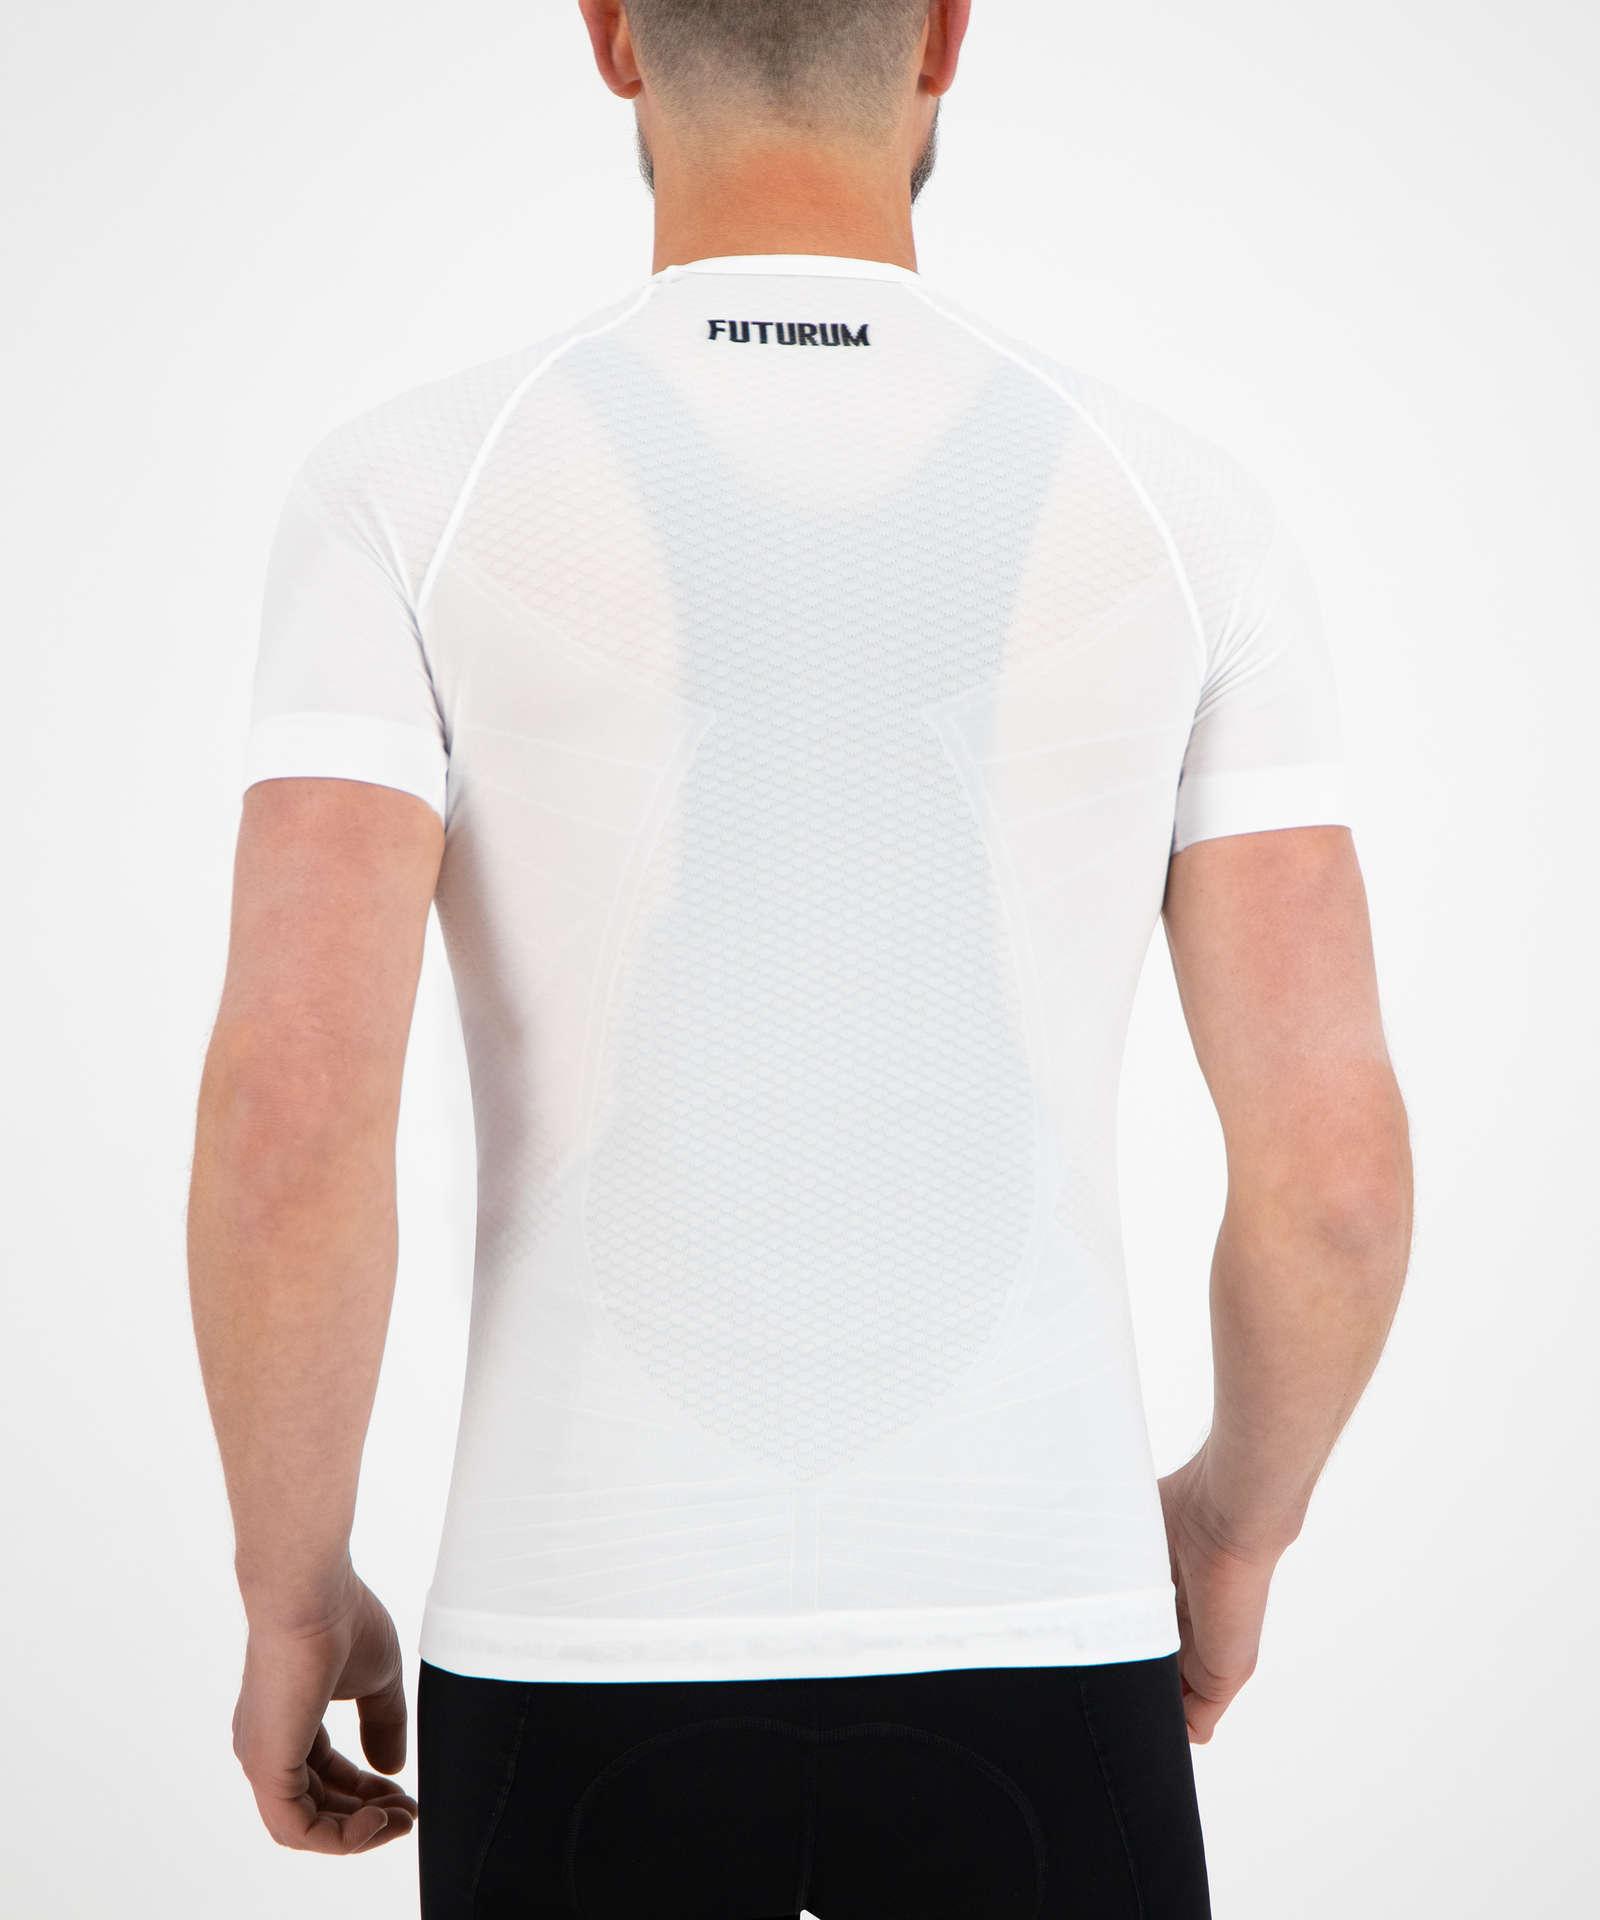 FUTURUM PROFORMANCE Base Layer Extra Cool White